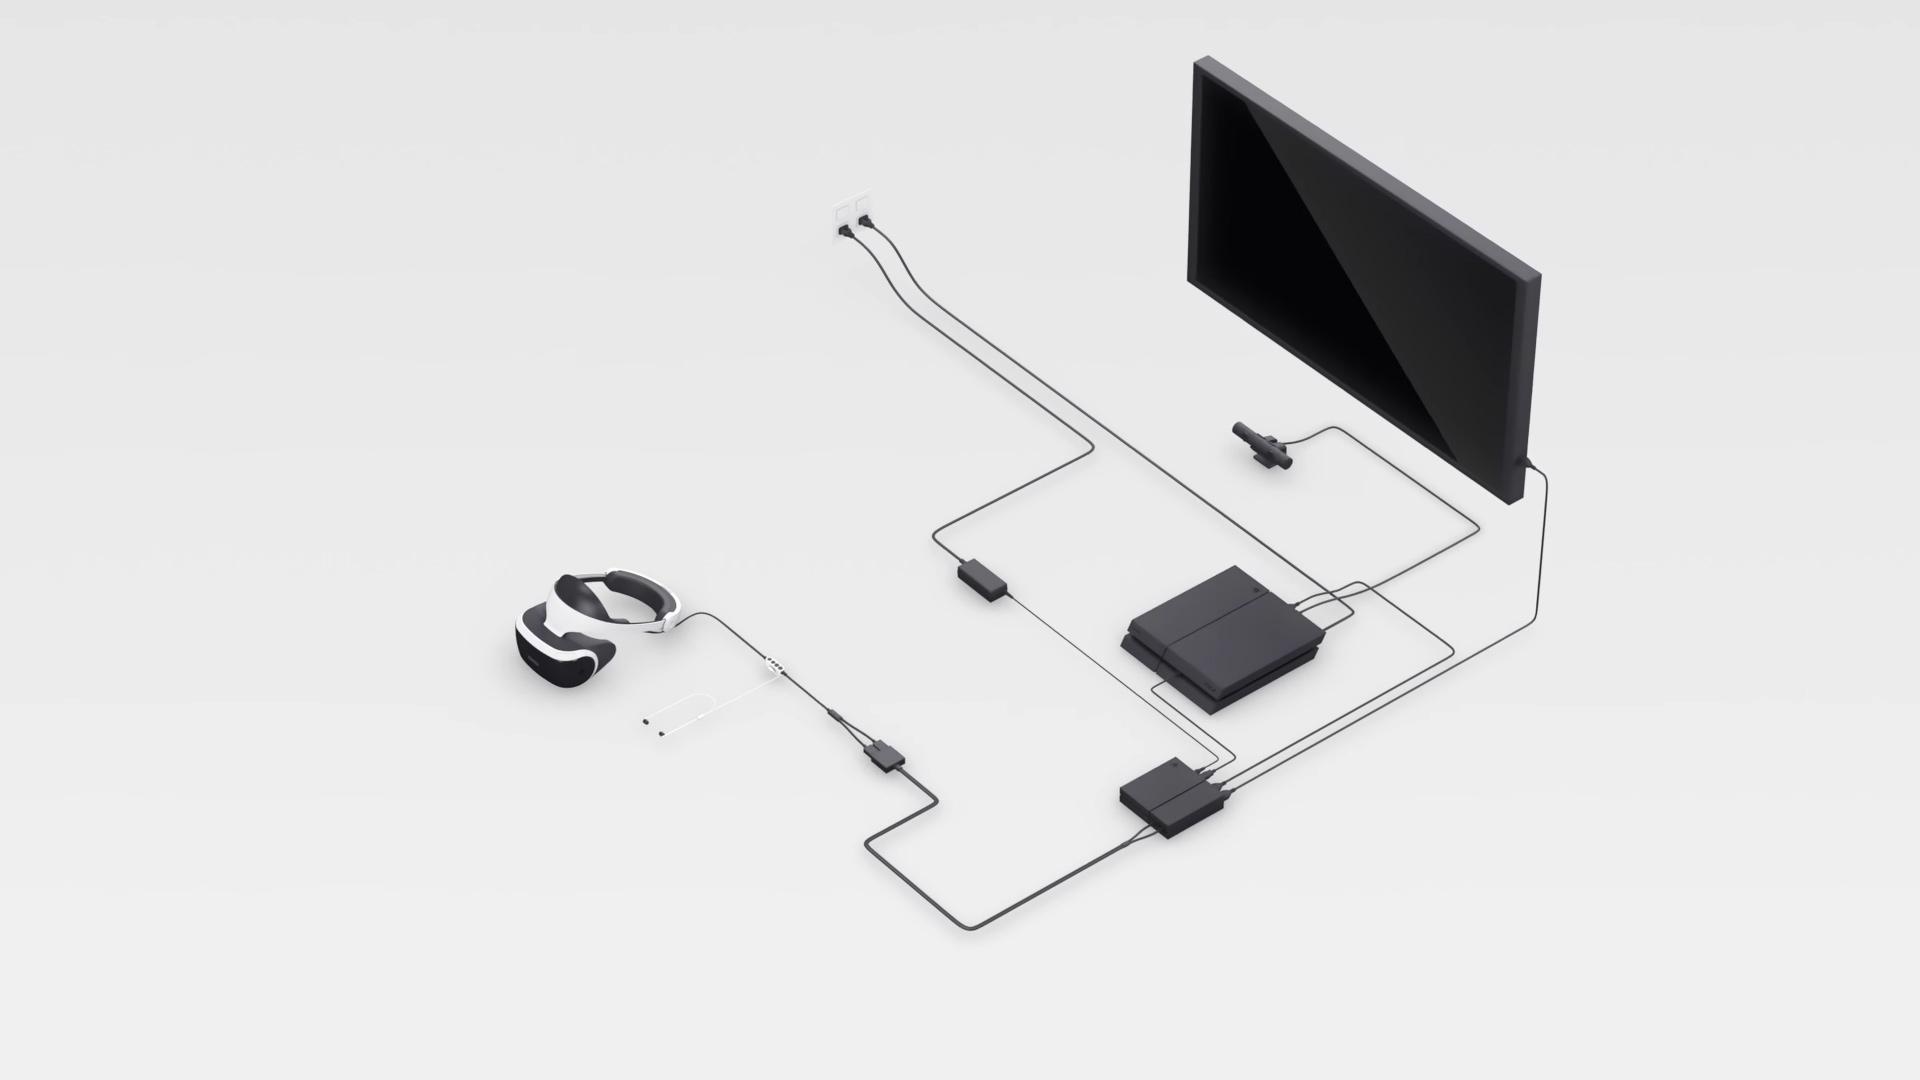 playstation-vr-setup.jpg